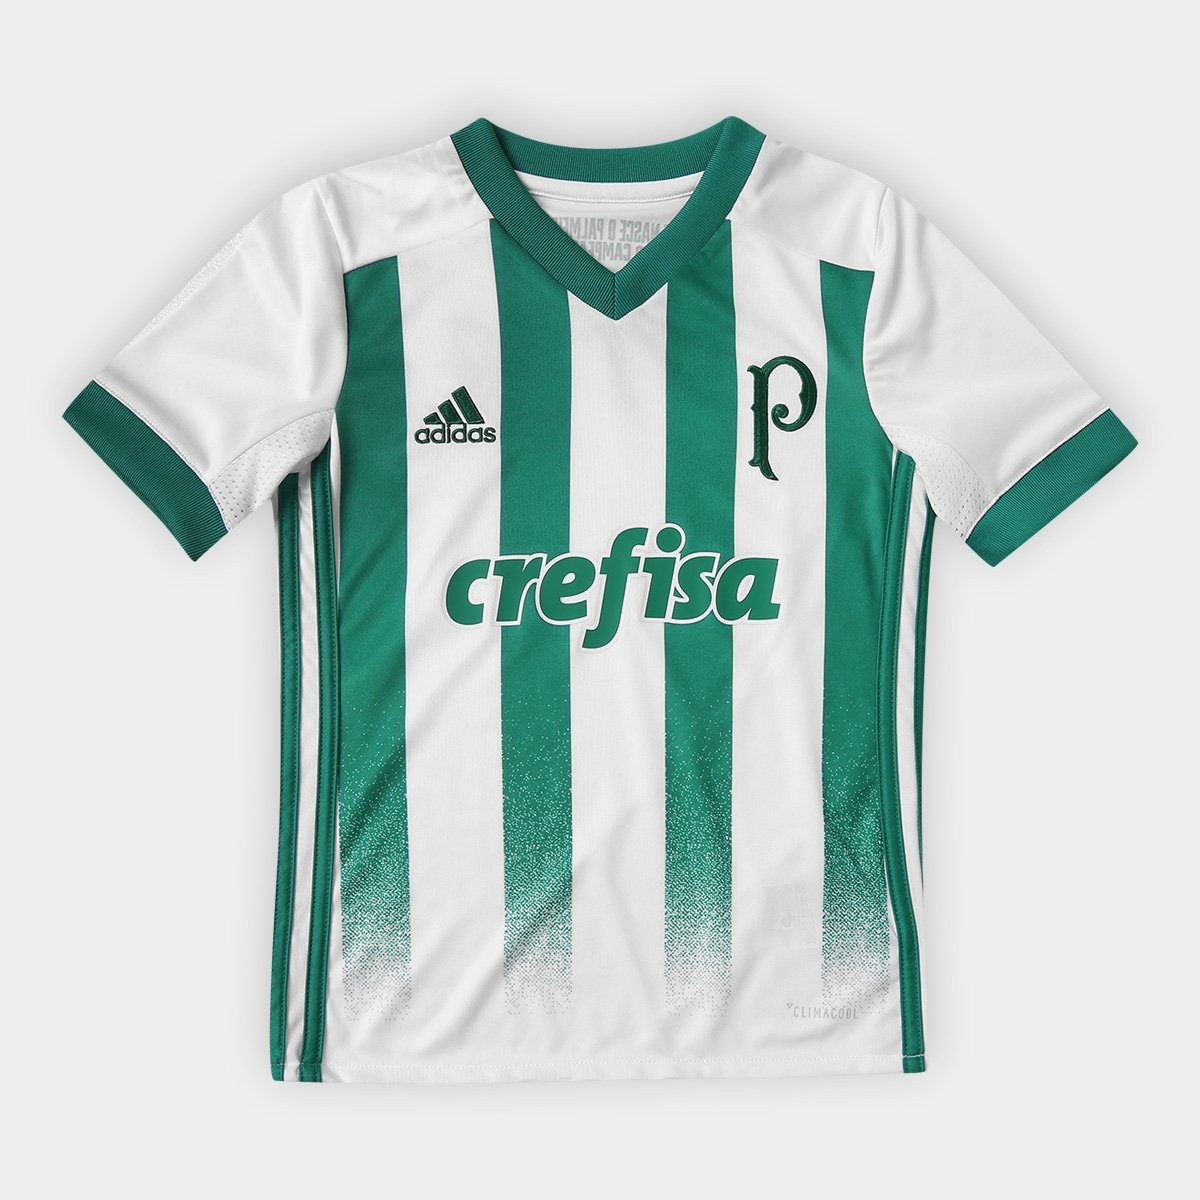 00dbee2d3c829 Camisa Palmeiras Infantil II 17 18 Torcedor Adidas